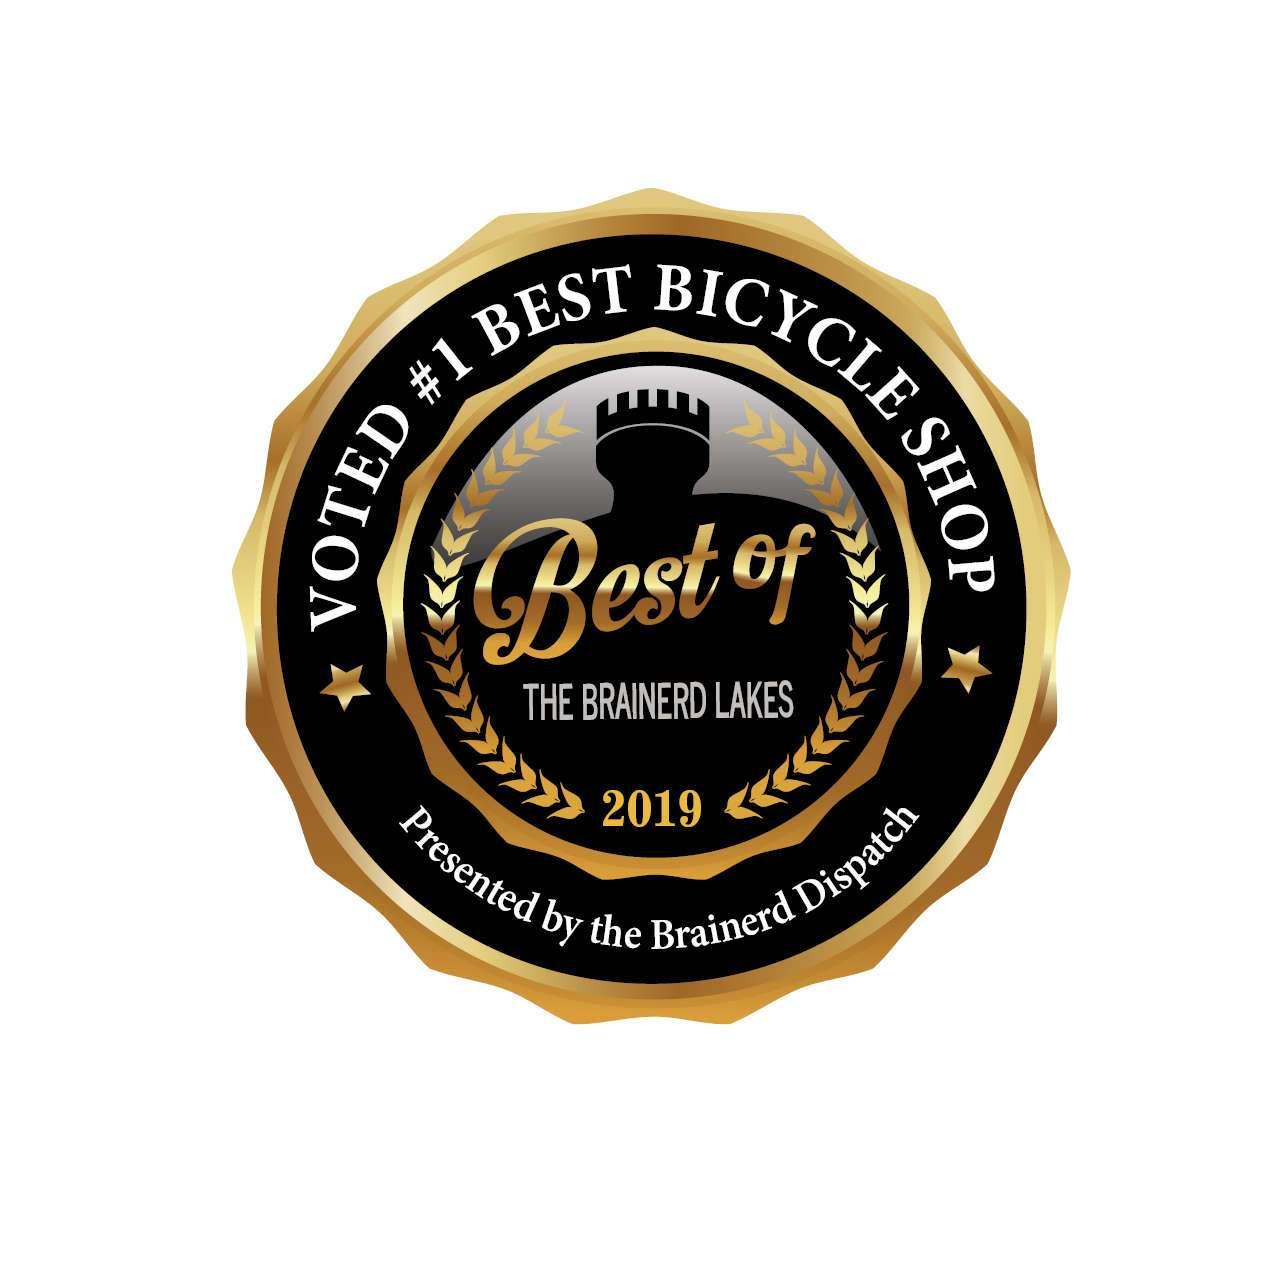 Brainerd Lakes Best Bicycle Shop - 2019